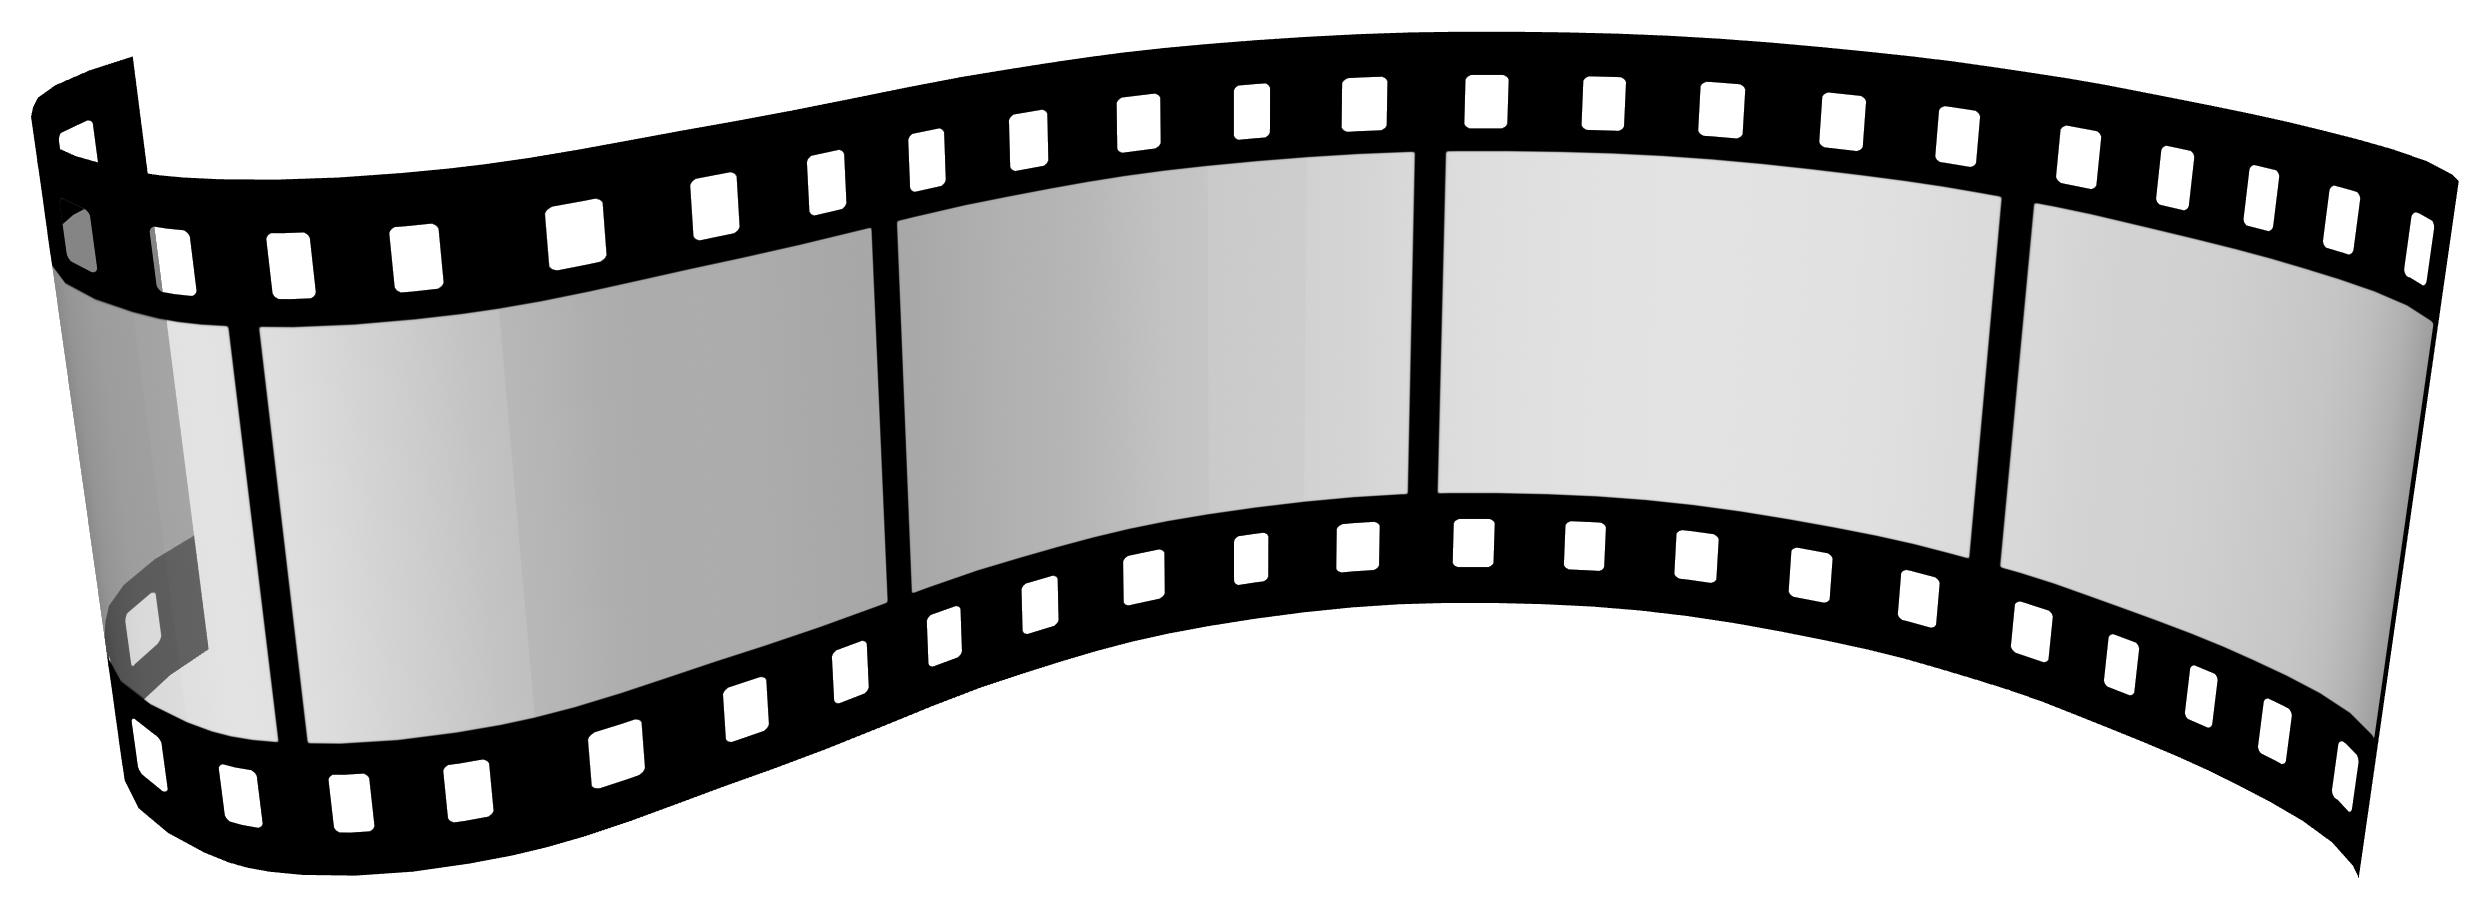 Film international strip